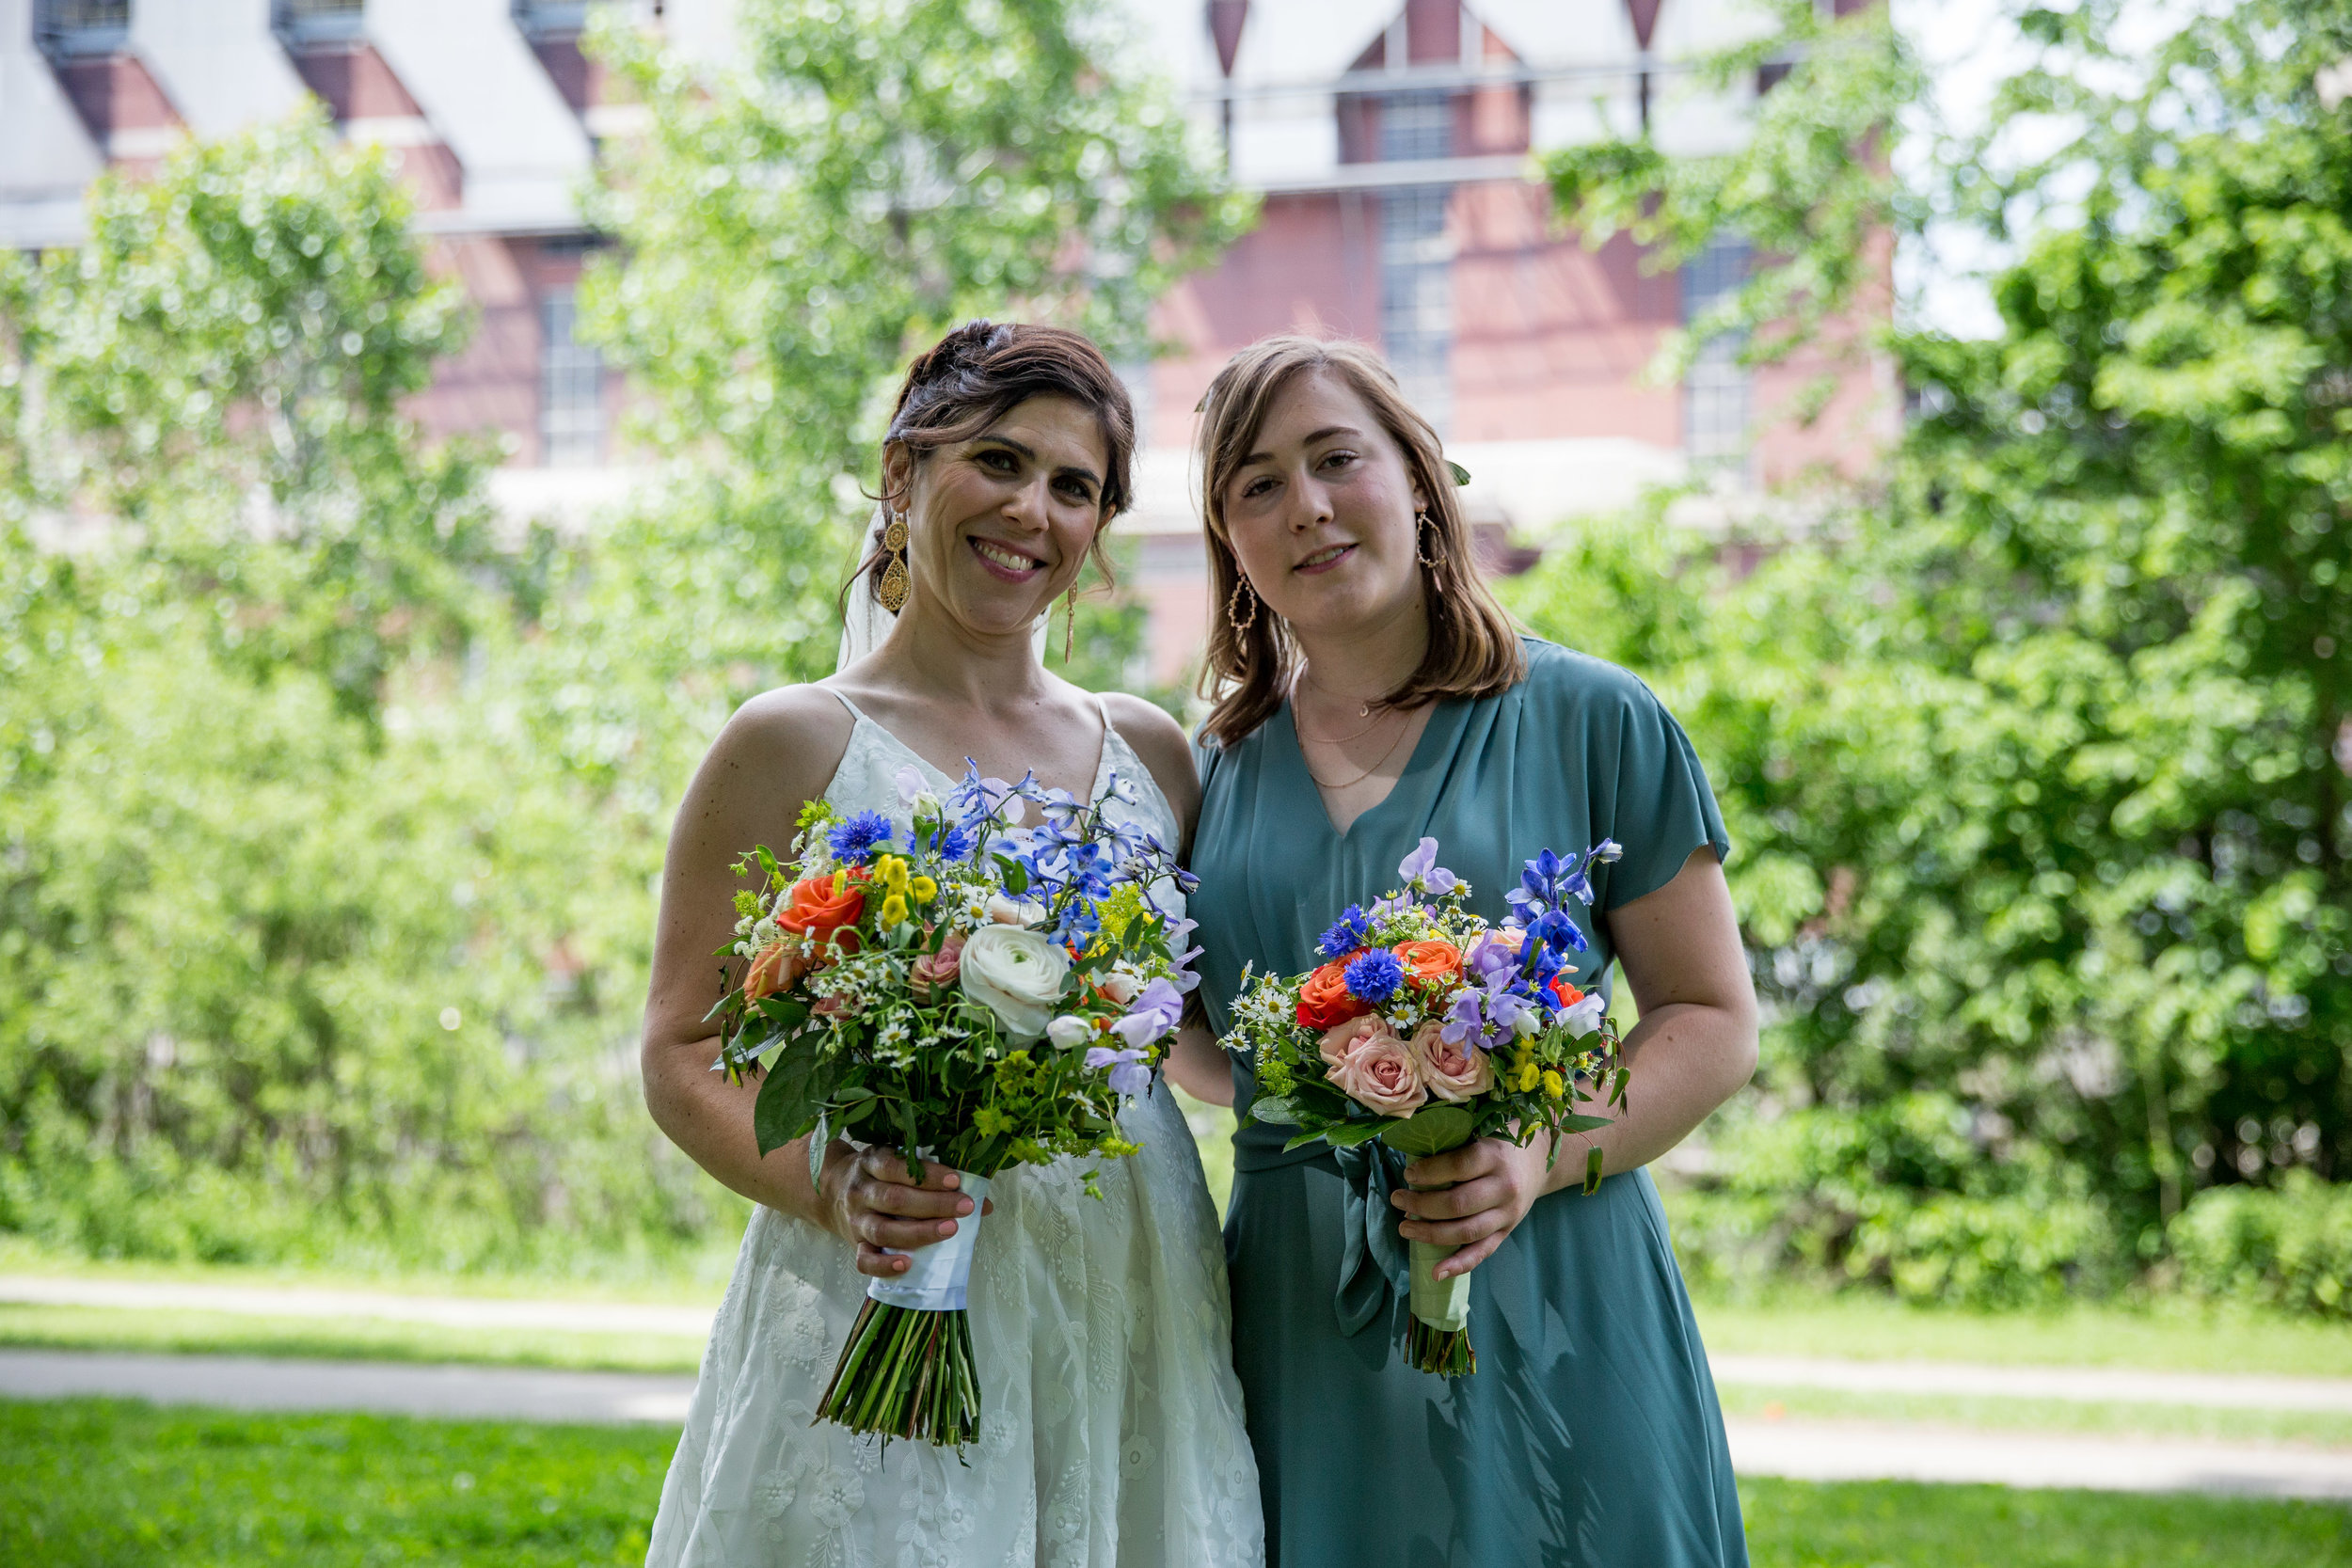 Natalie and Dallas Mooney Wedding 6-8-19_Tania Watt Photography-281.jpg